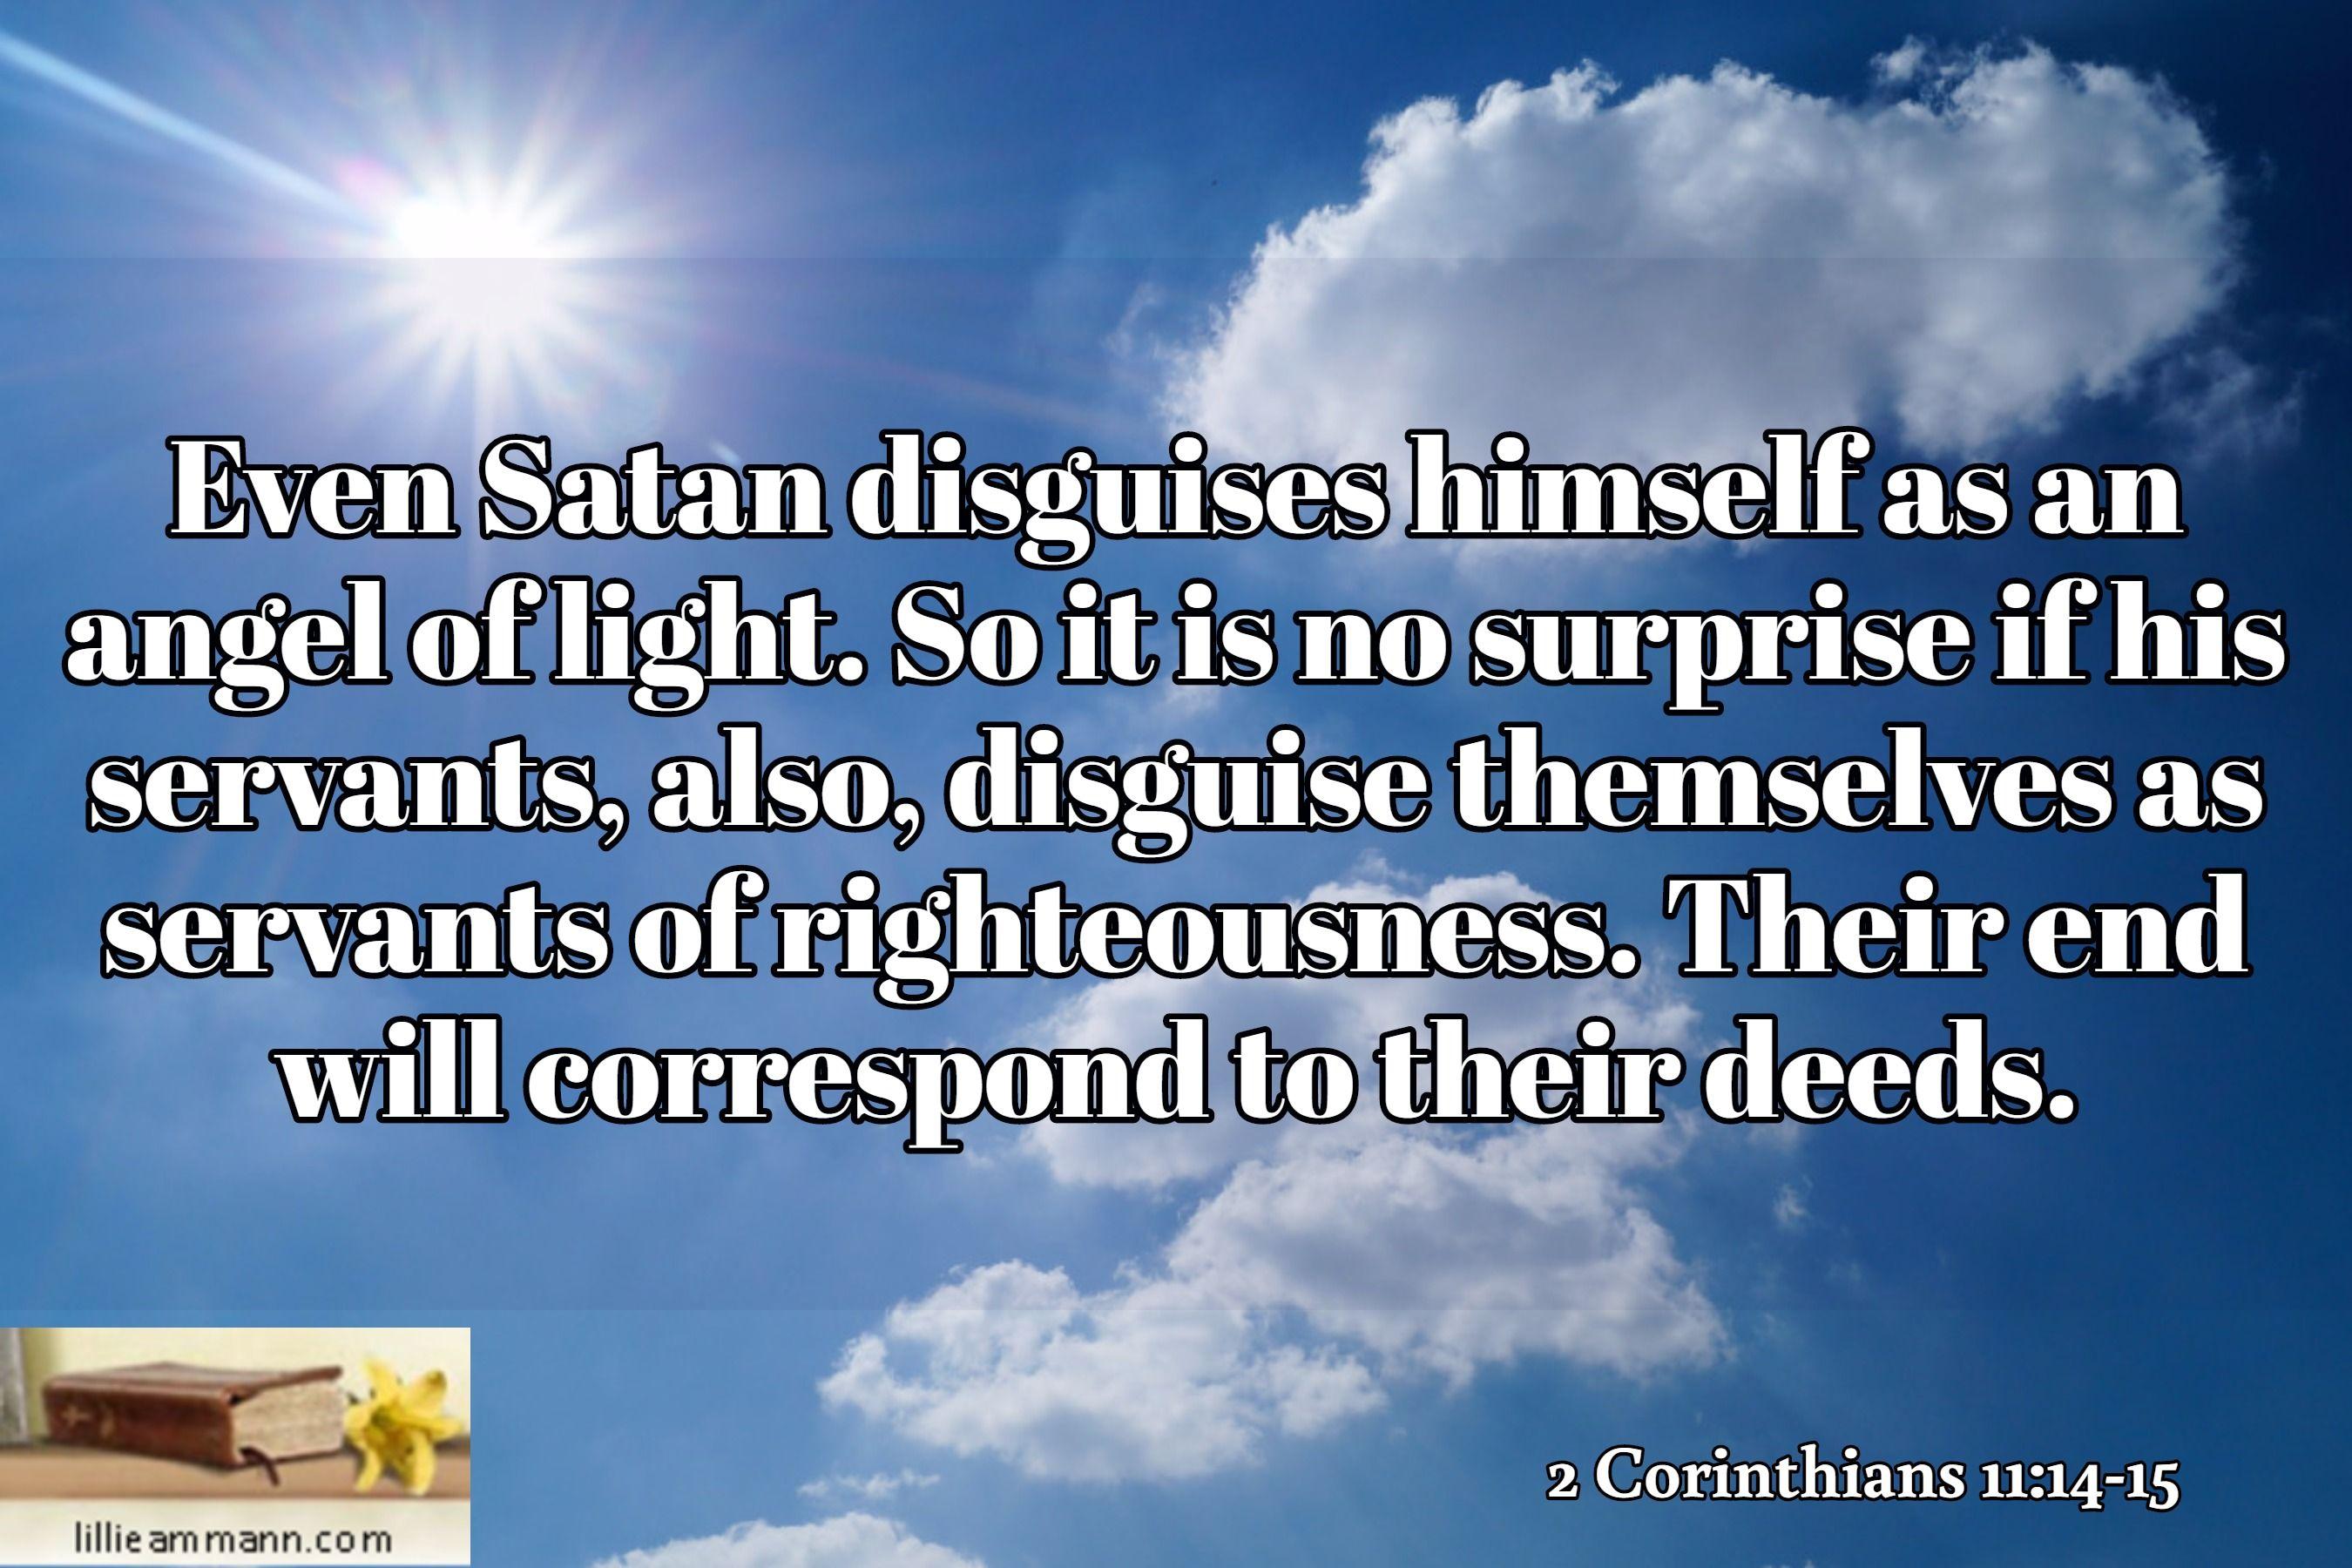 2 Corinthians Even Satan disguises himself as an angel